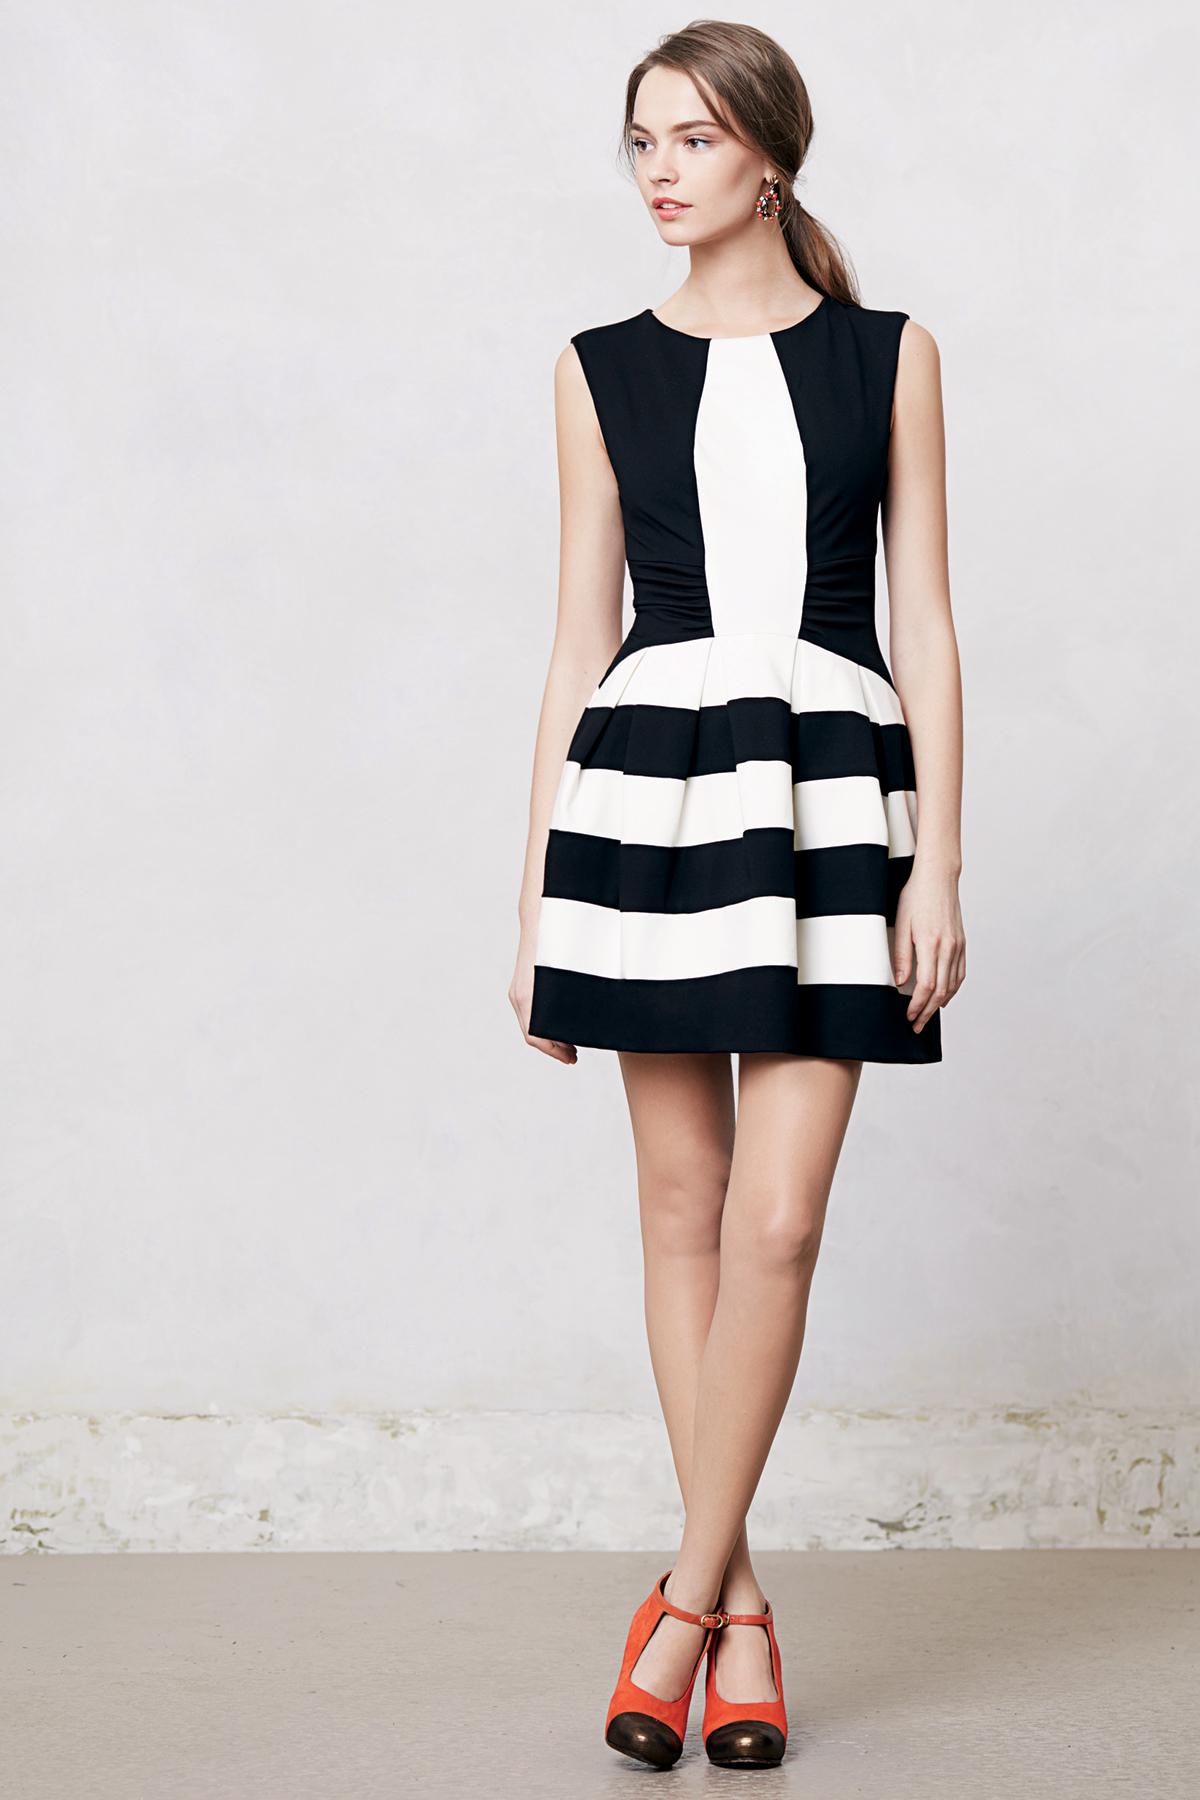 black-and-white-wedding-dress-4